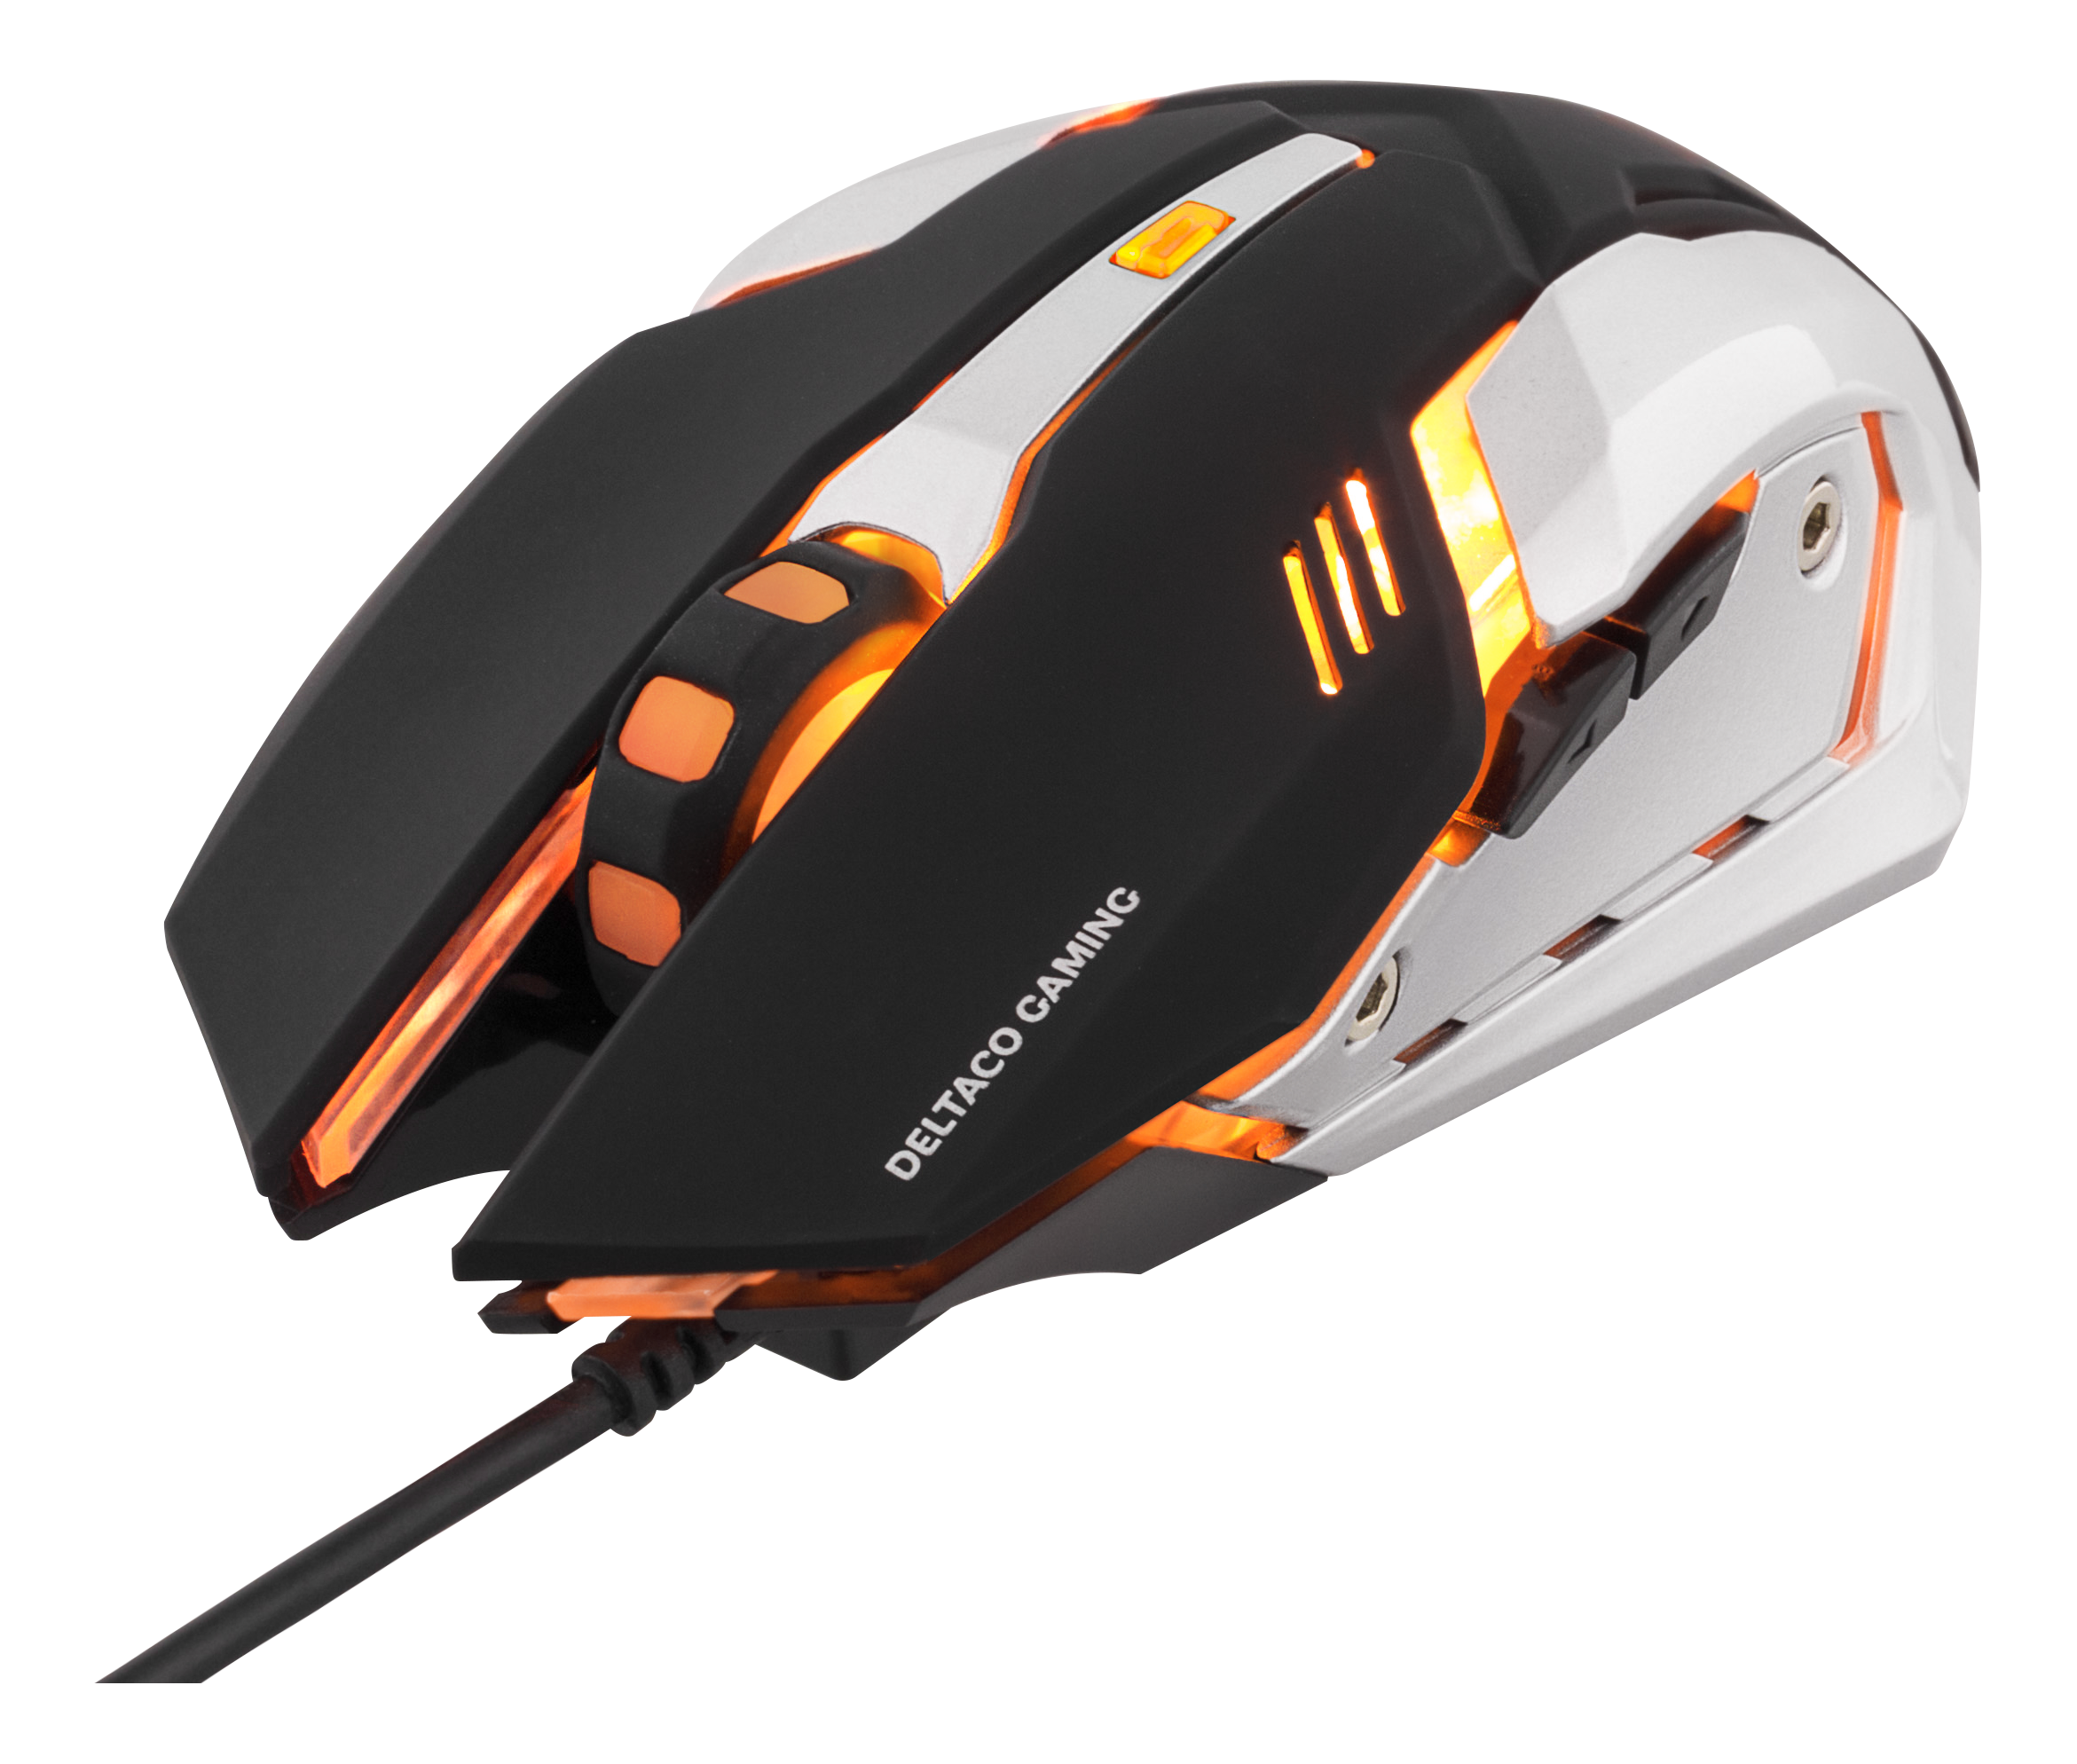 DELTACO GAMING optical mouse, orange LEDs, black/silver XL-GM46